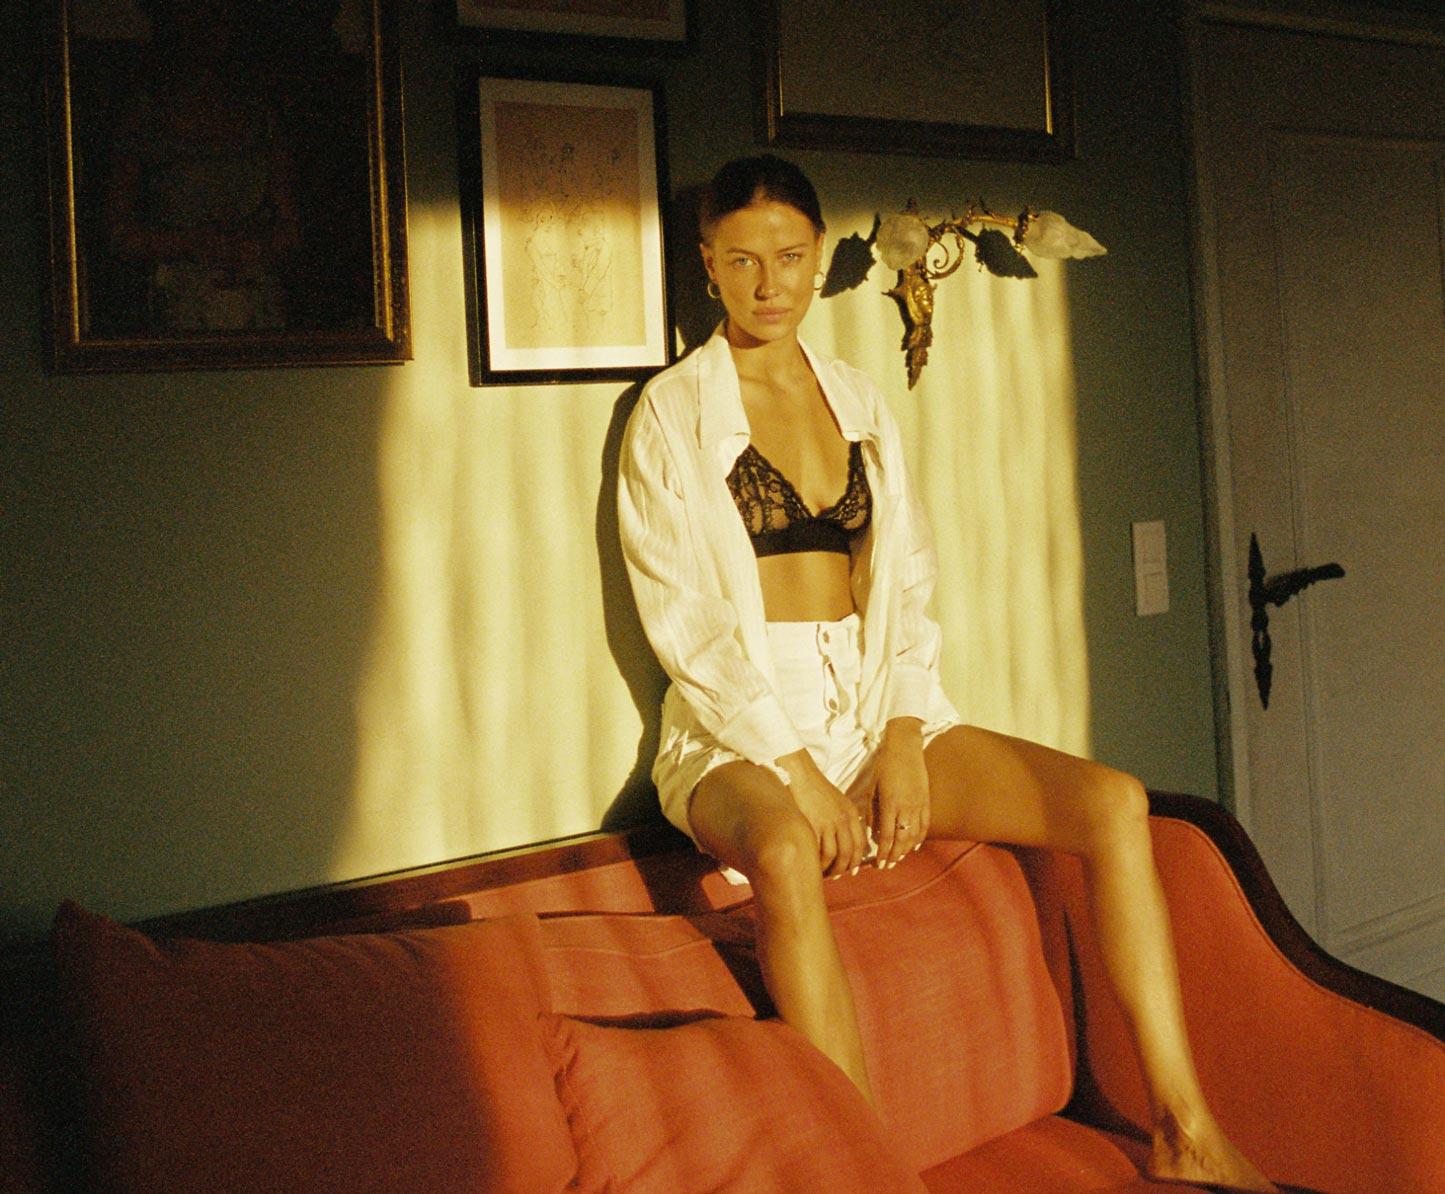 philipp gladsome vintage photography nicole poturalski